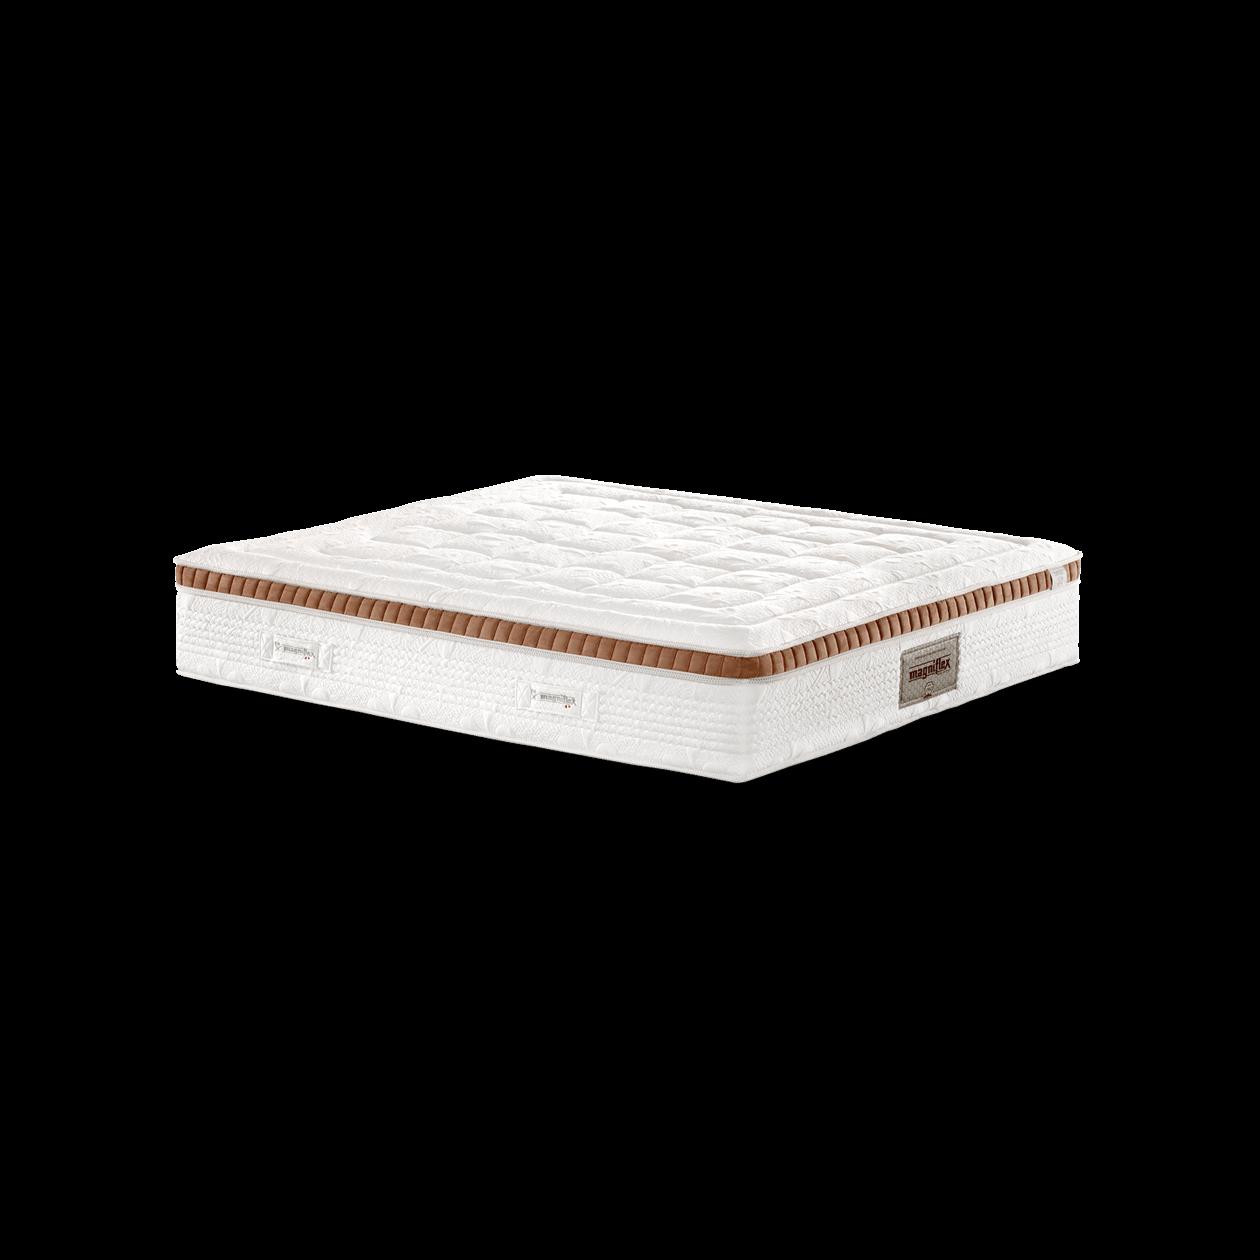 Armonia dual матрак, от Magniflex